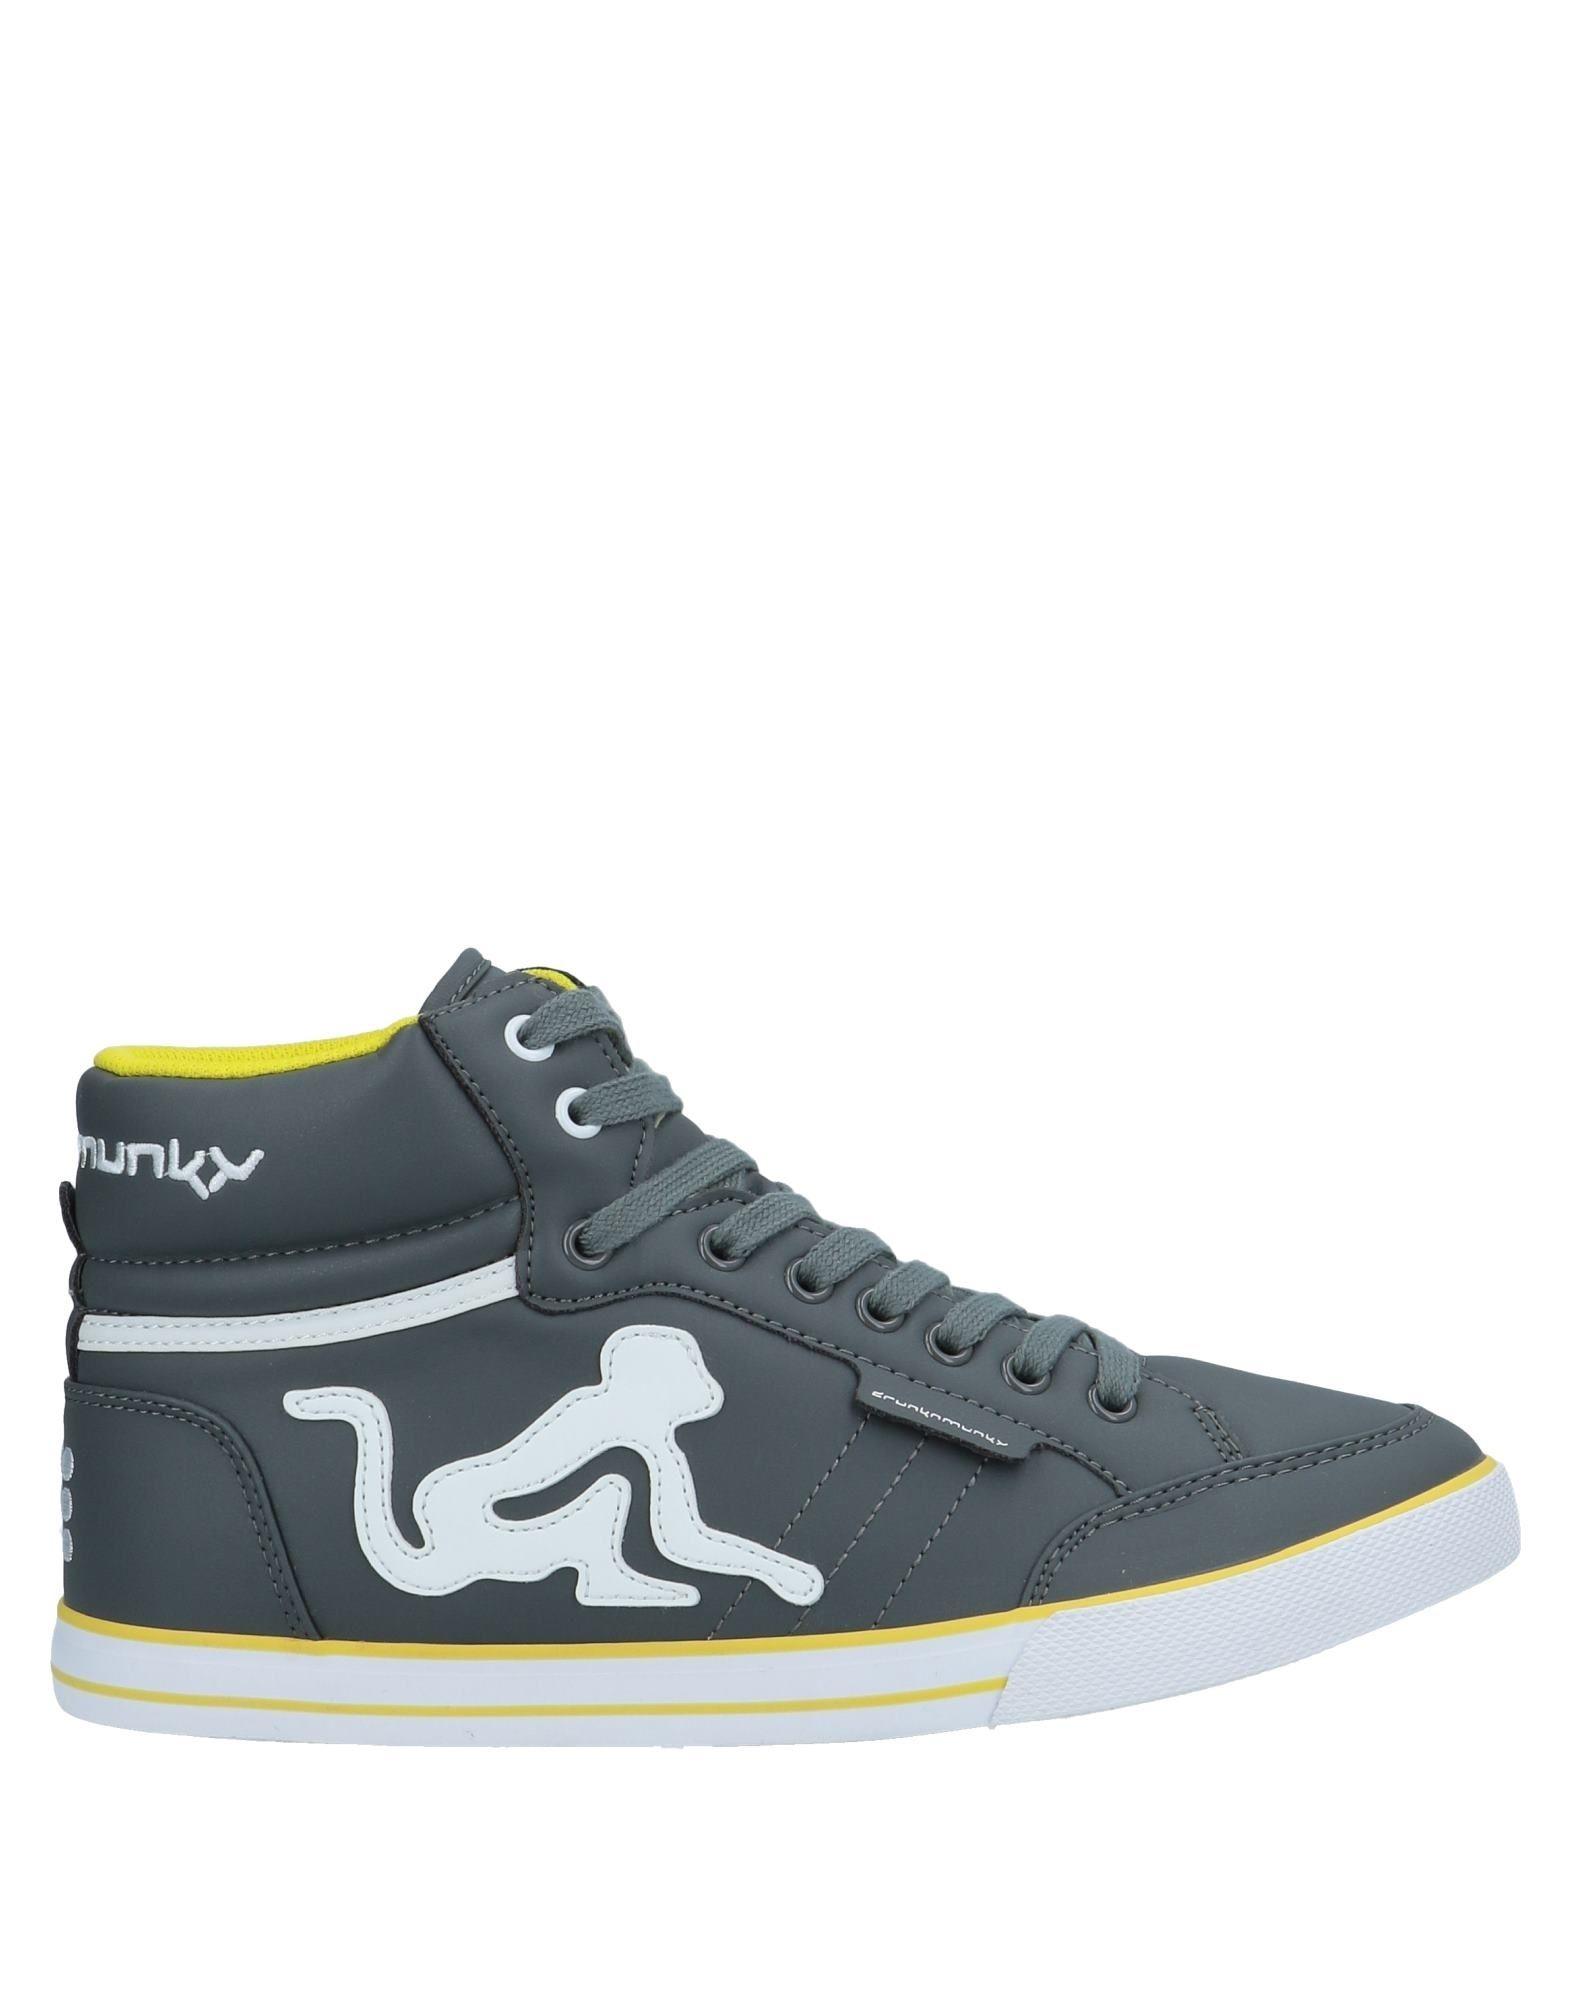 Rabatt echte  Schuhe Drunknmunky Sneakers Herren  echte 11417521JD 2f377f